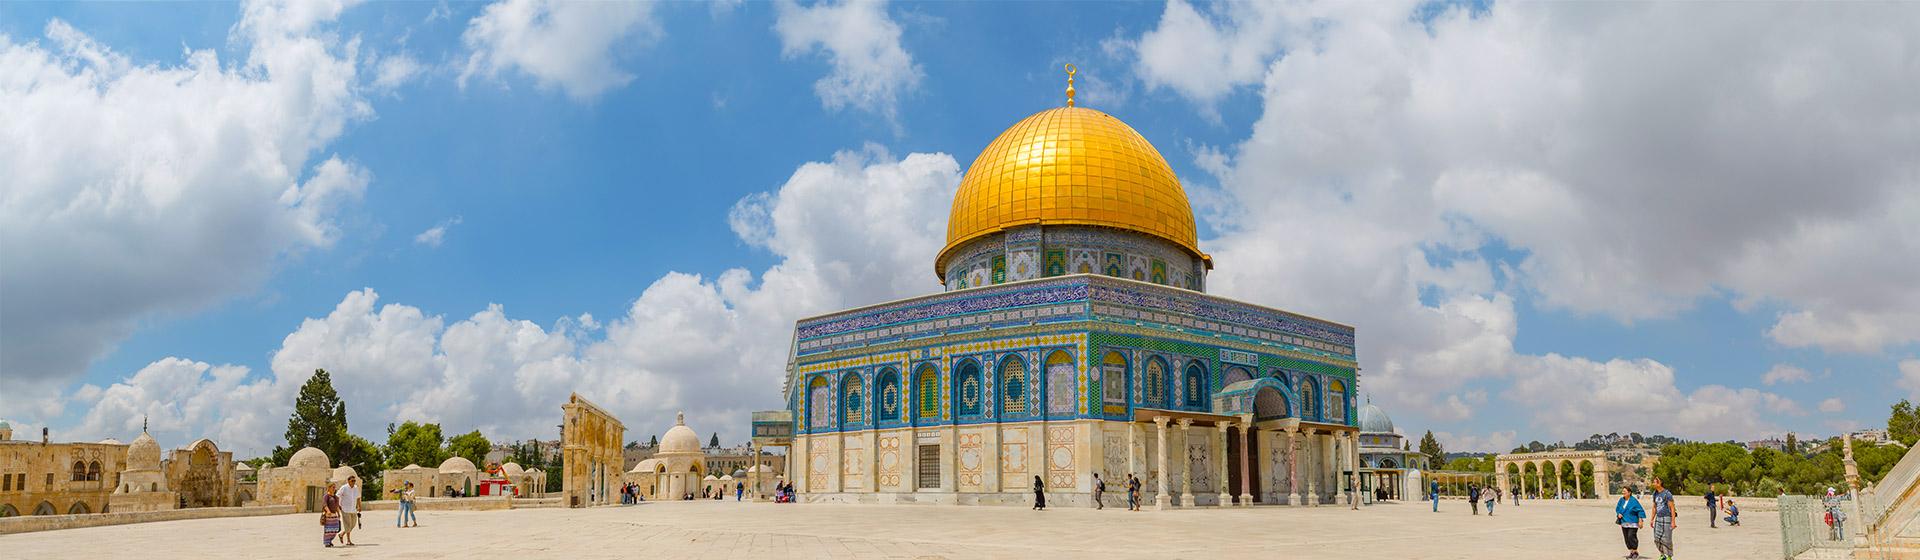 Ofertas de viajes a Israel